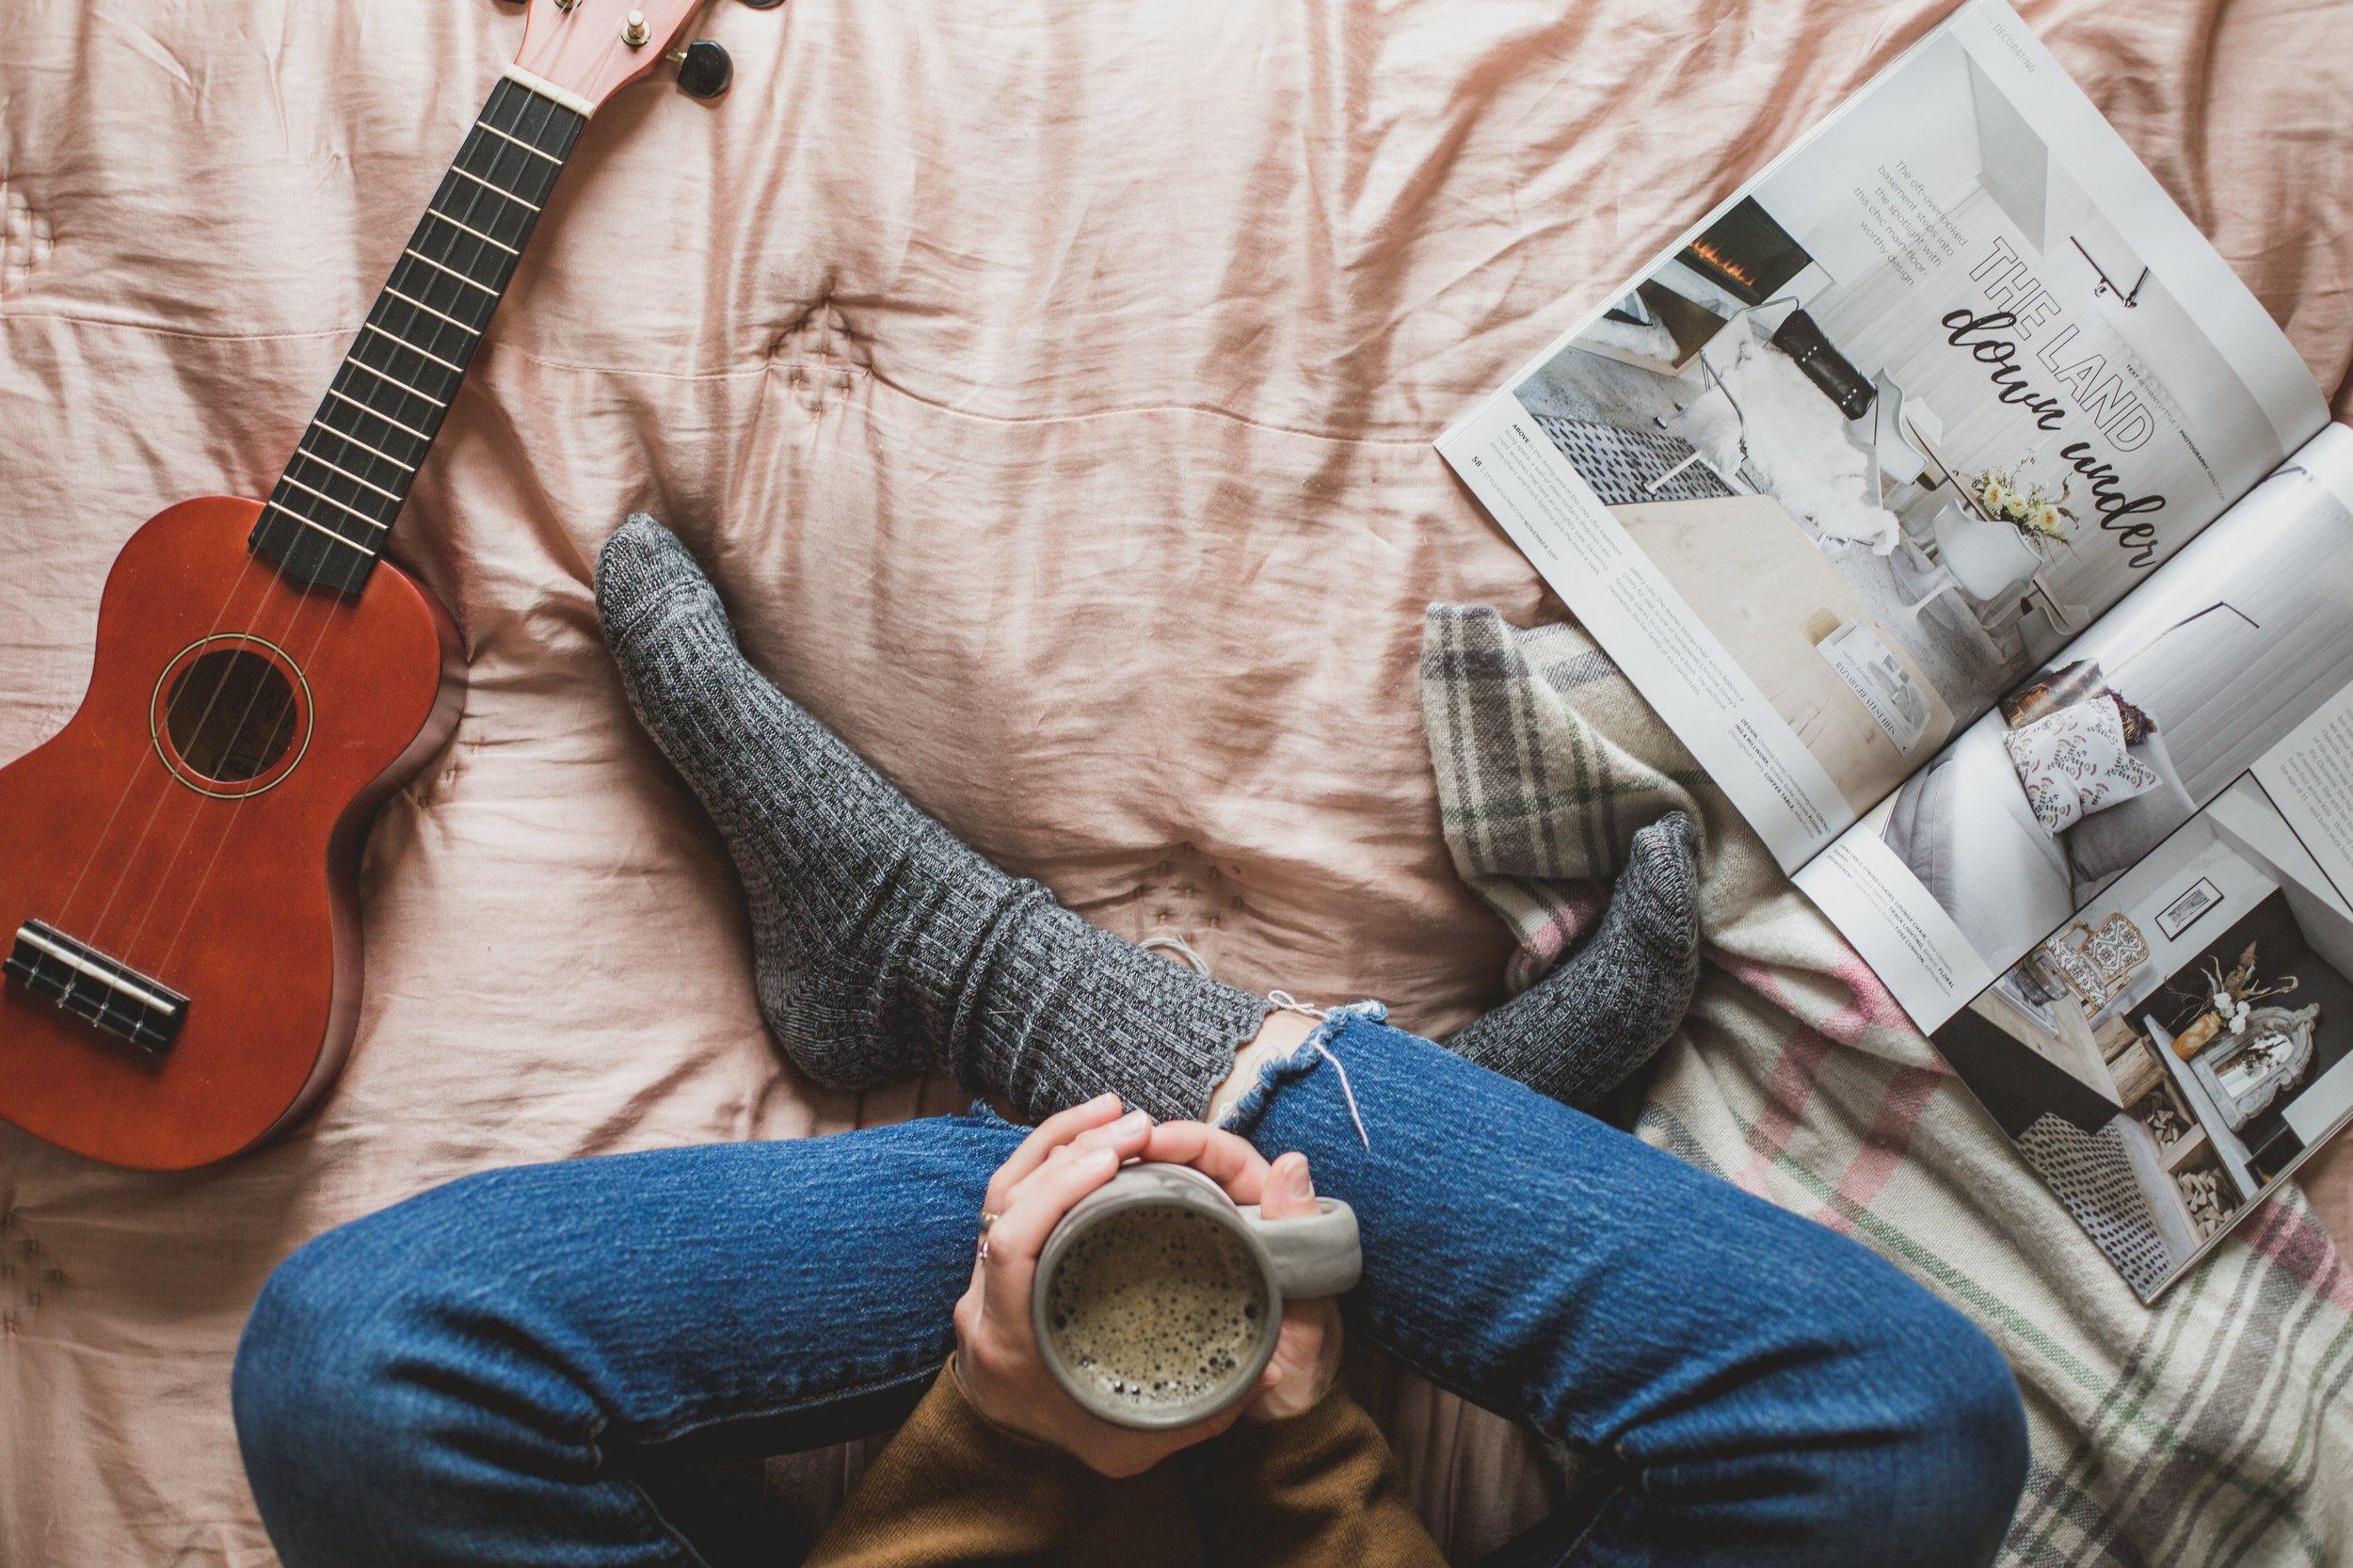 cozy-reading-in-bed_4460x4460.jpg